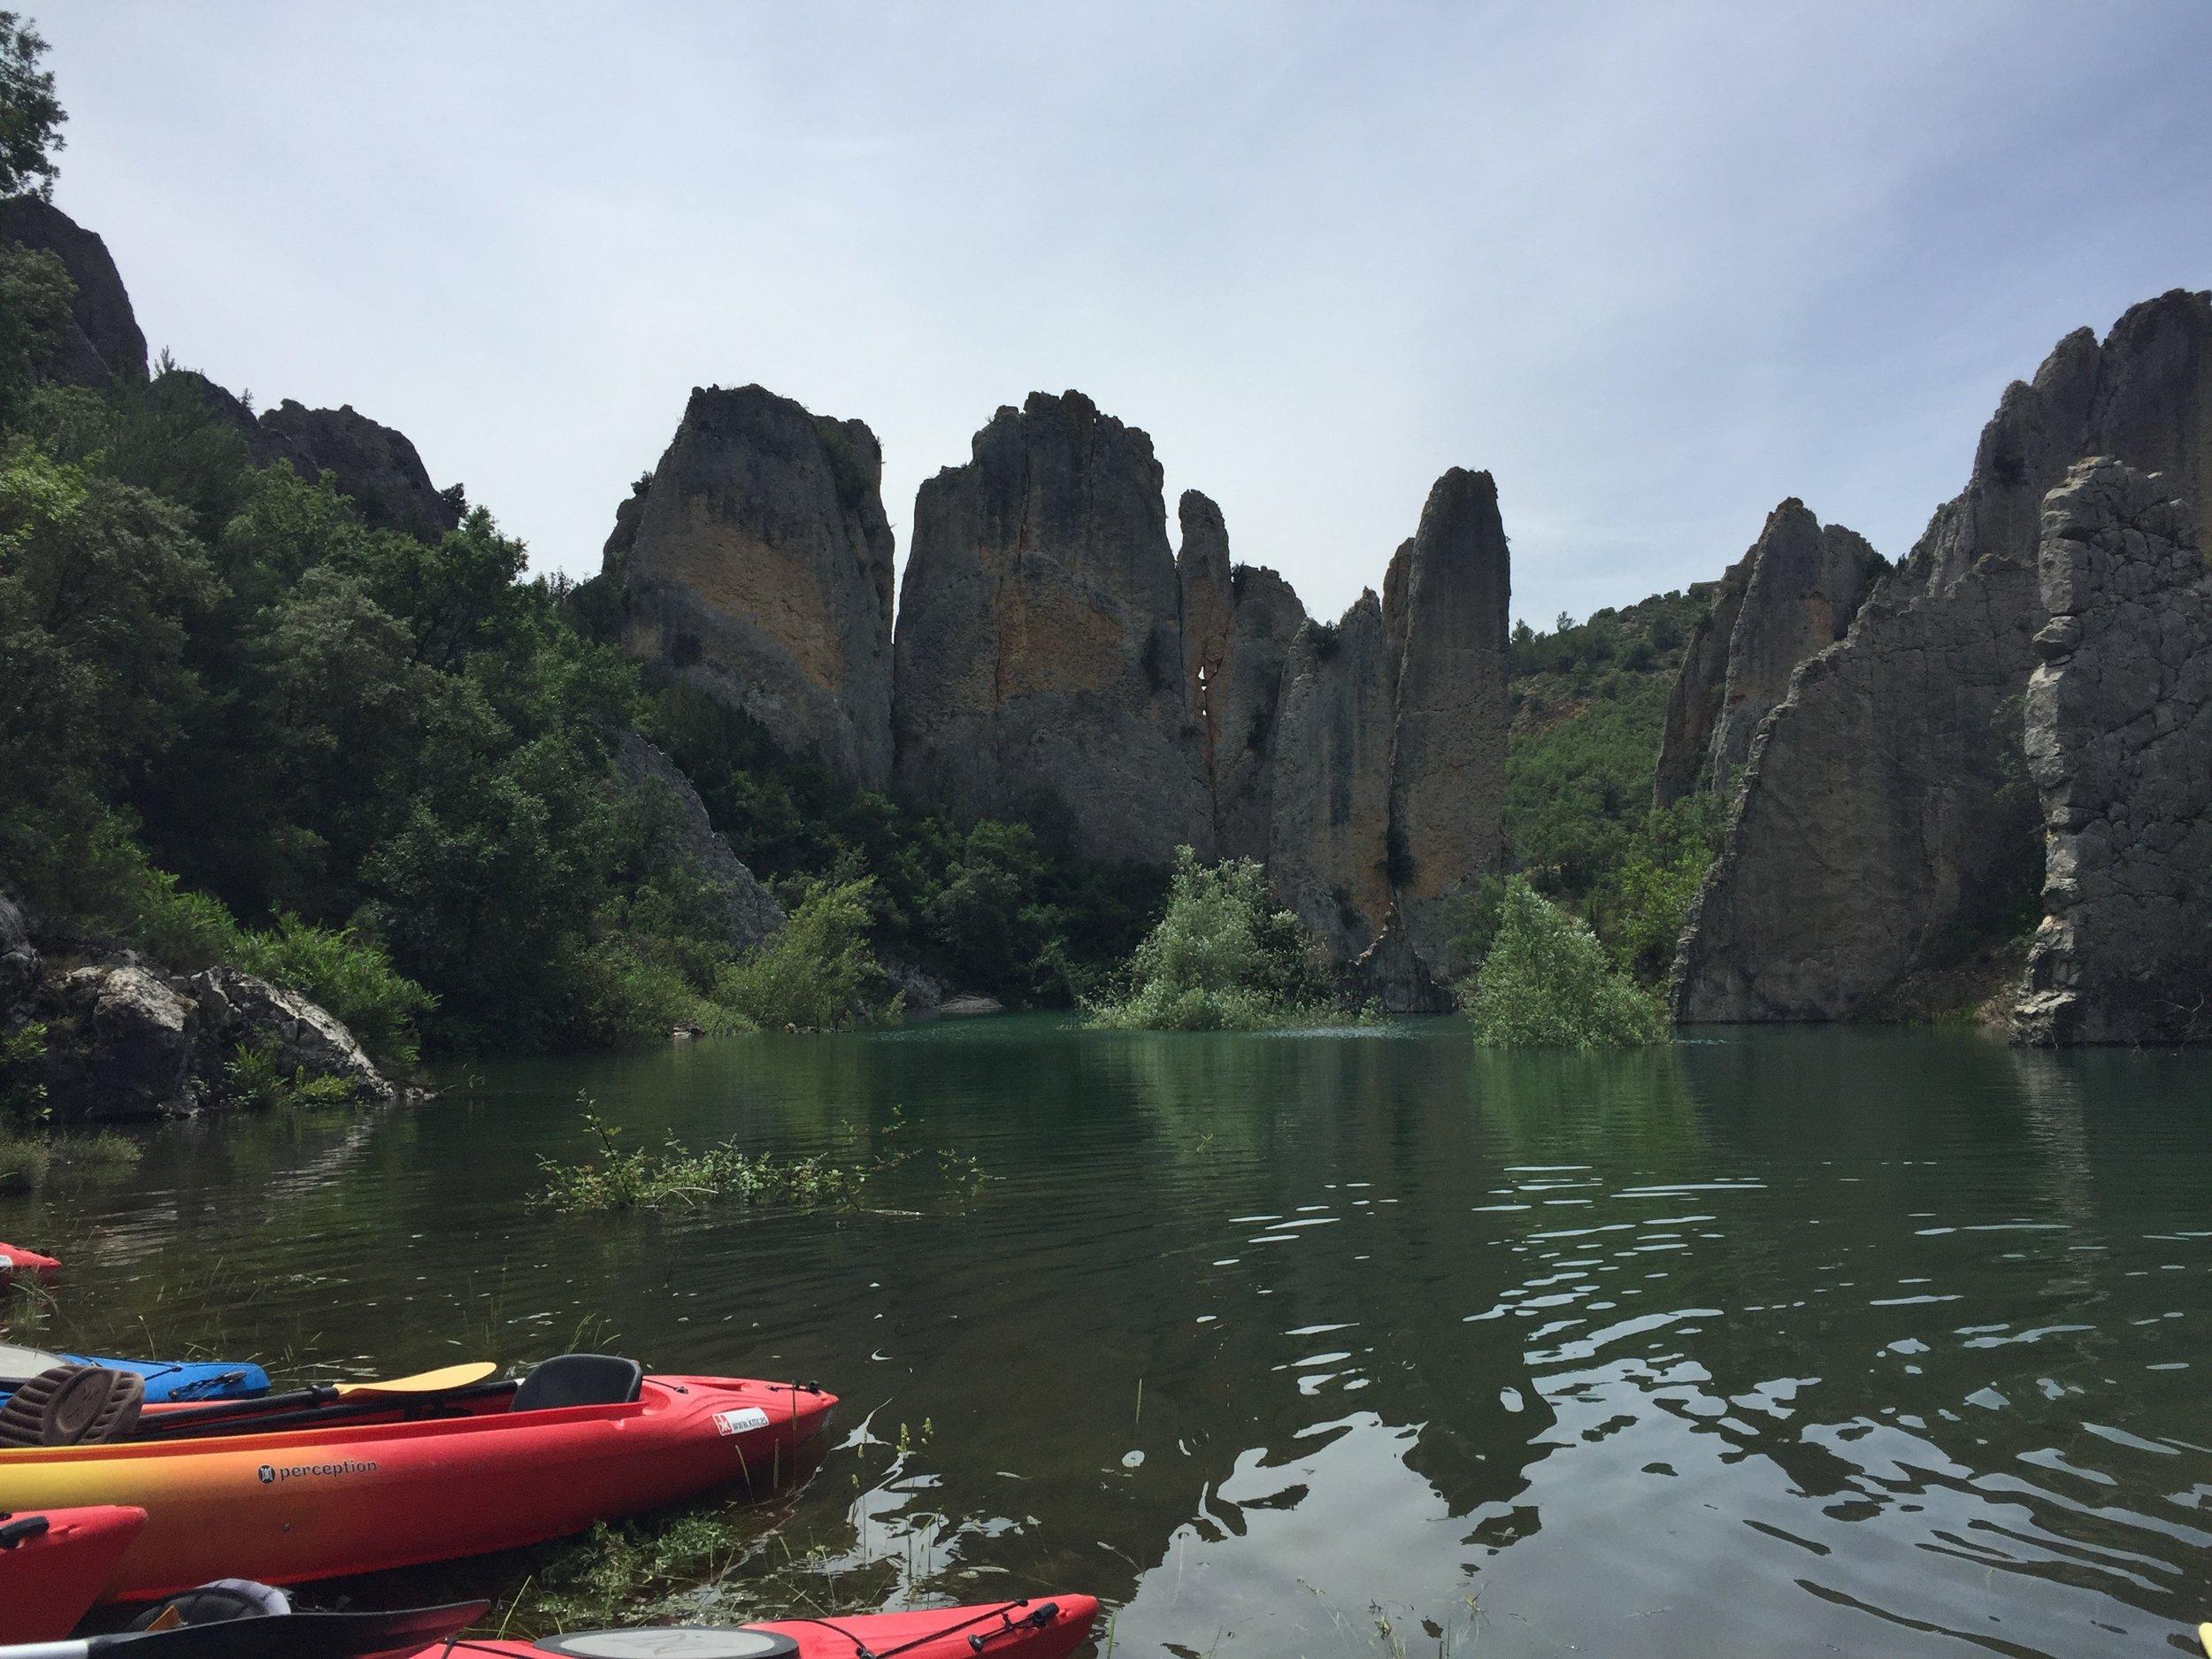 kayaking panta canelles muralla finestres.JPG